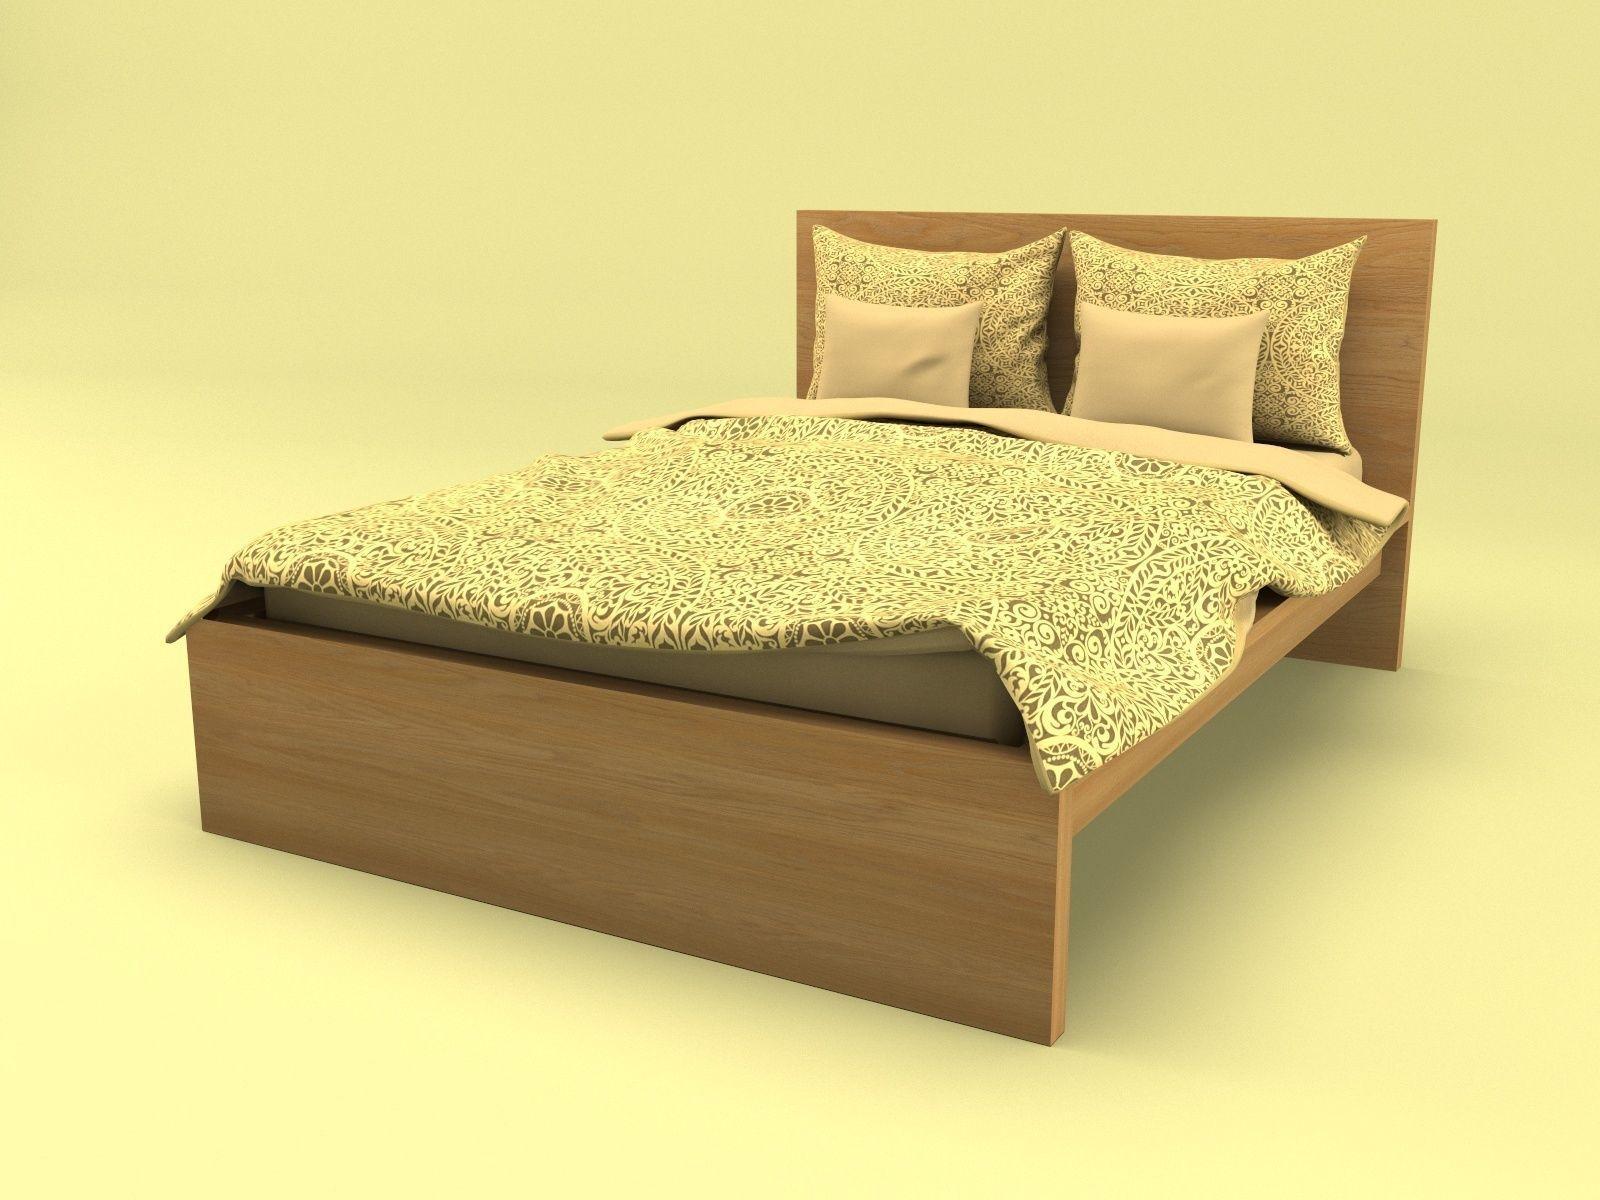 Ikea Malm Bed 3d Model 3d Model